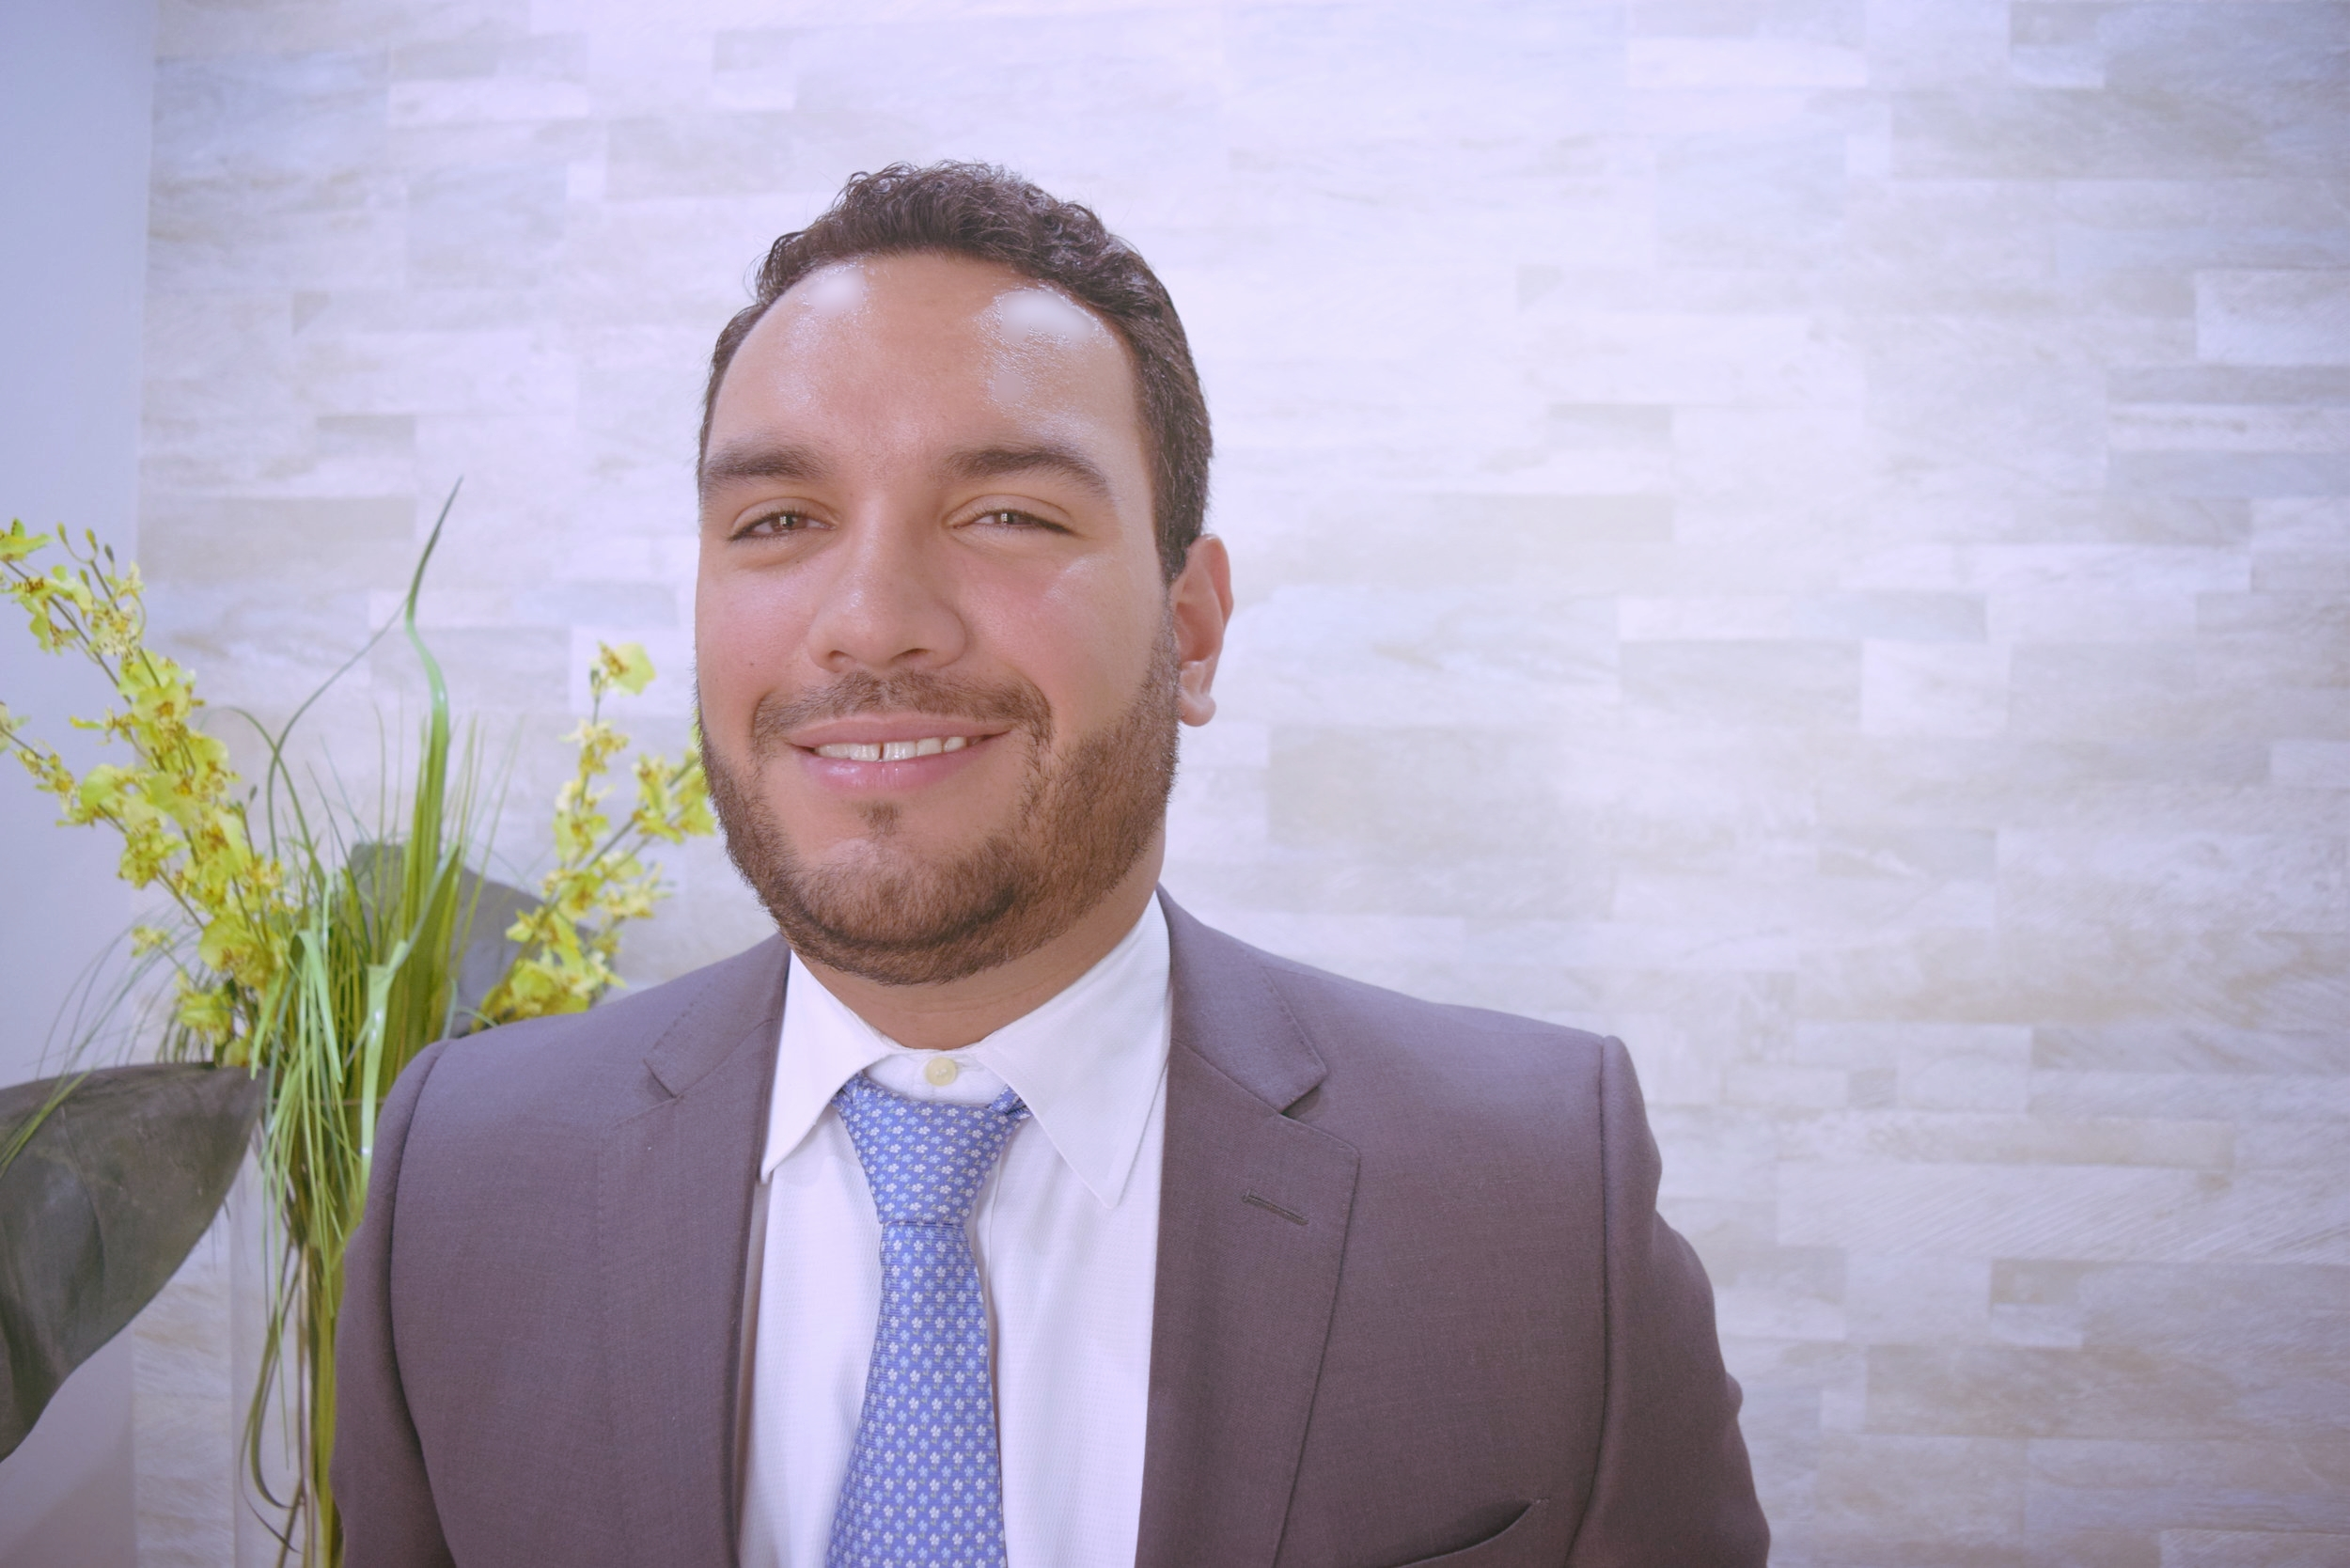 Mr. Ricardo Pabón-Degláns